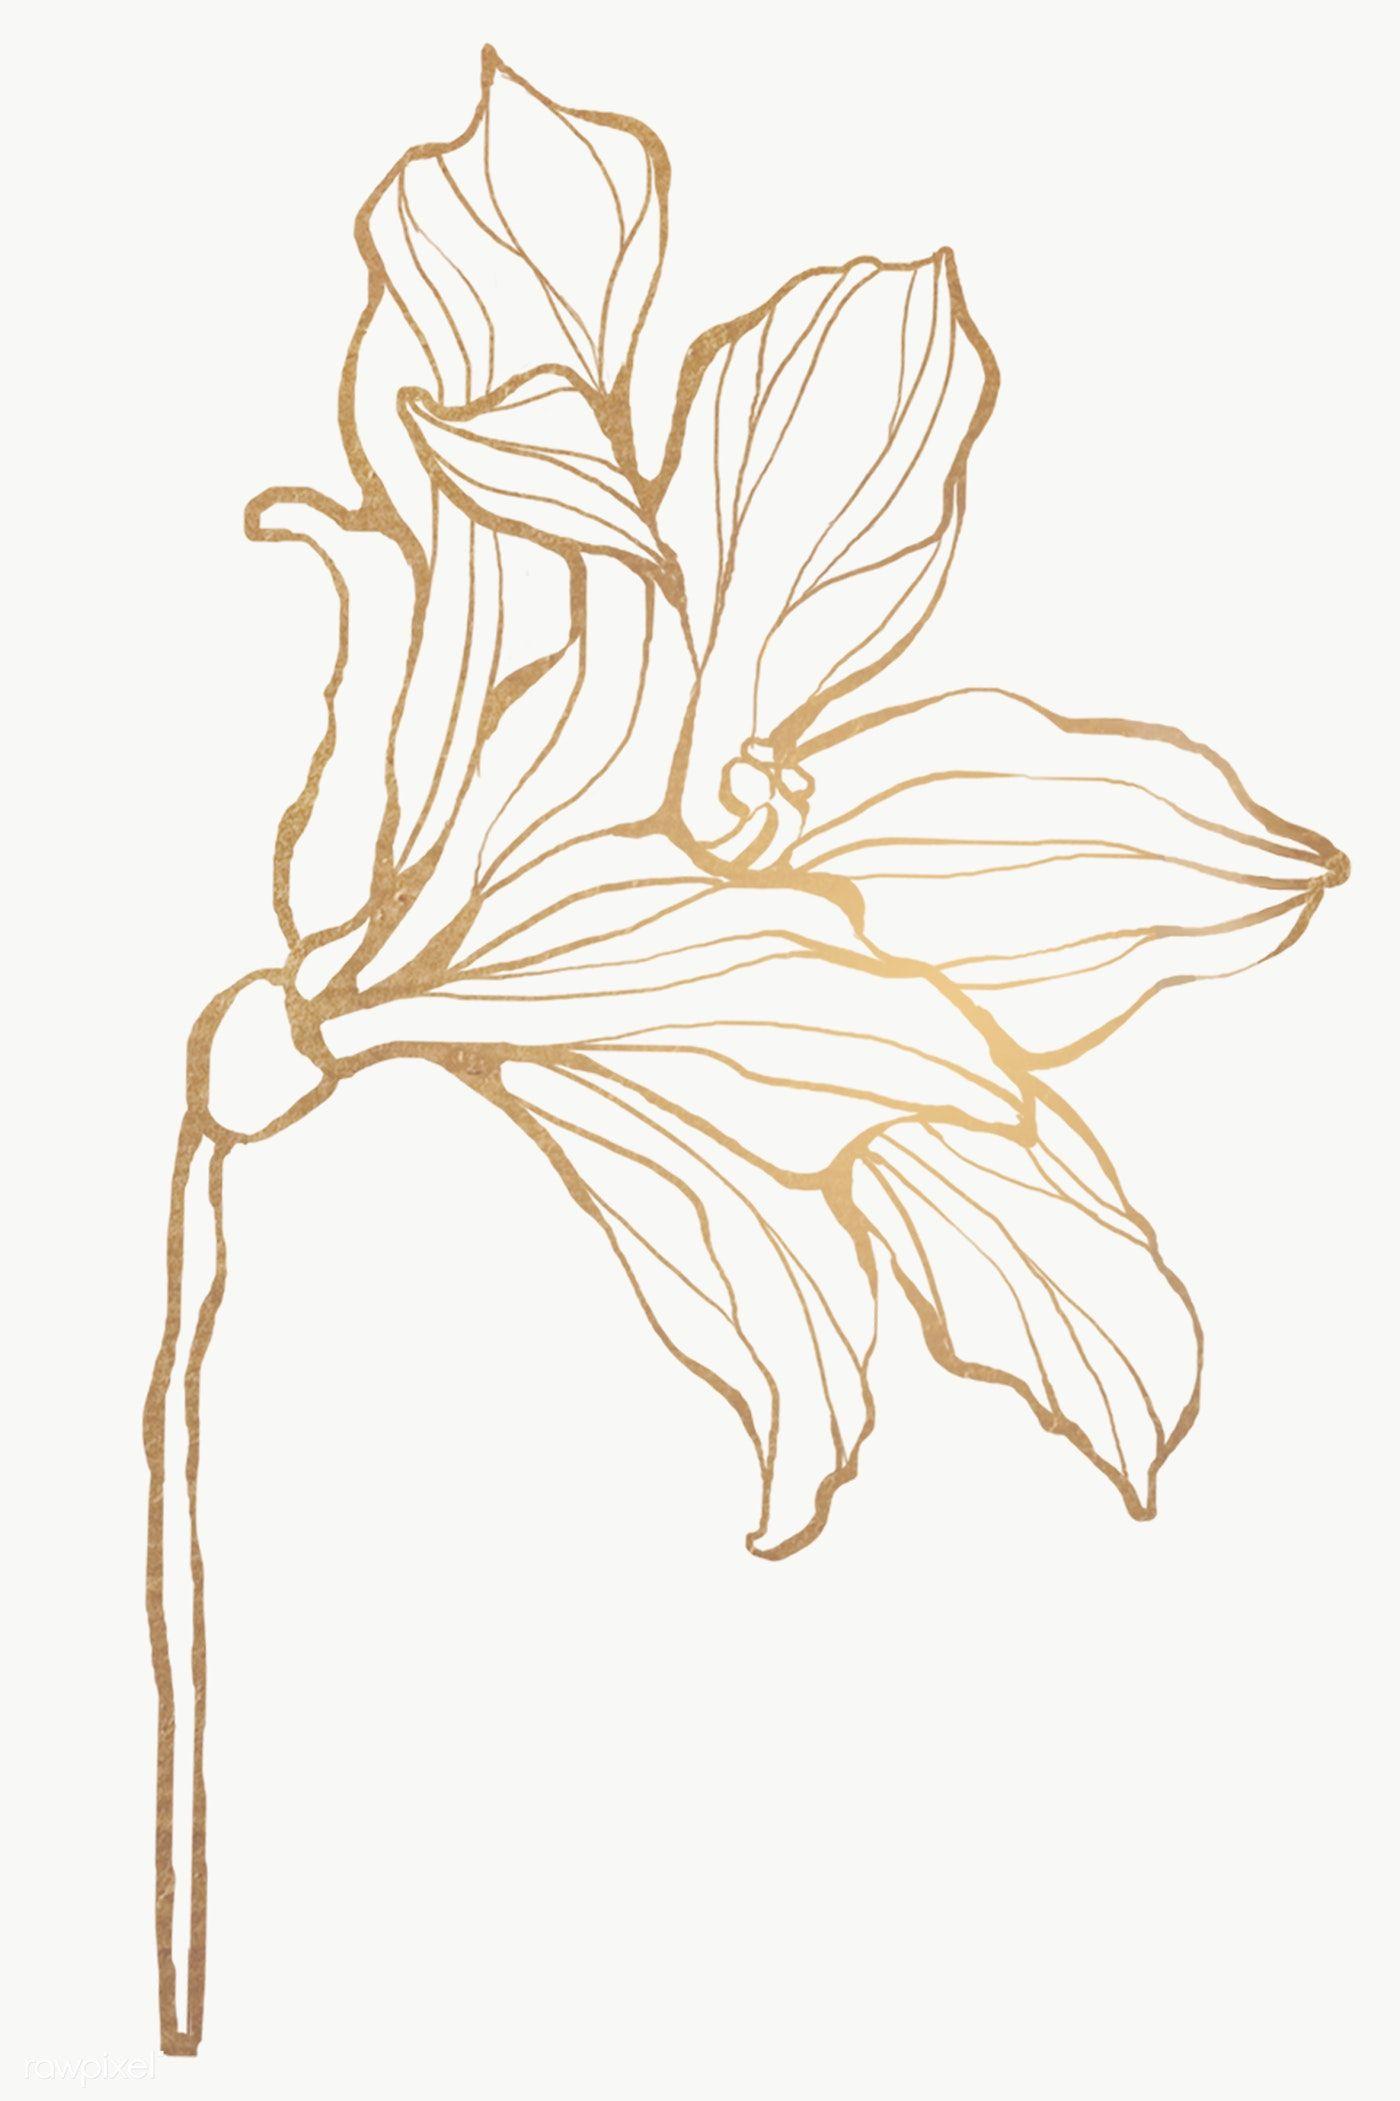 Detailed Golden Leaves Transparent Pg Premium Image By Rawpixel Com Nunny Line Art Flowers Flower Drawing Flower Outline